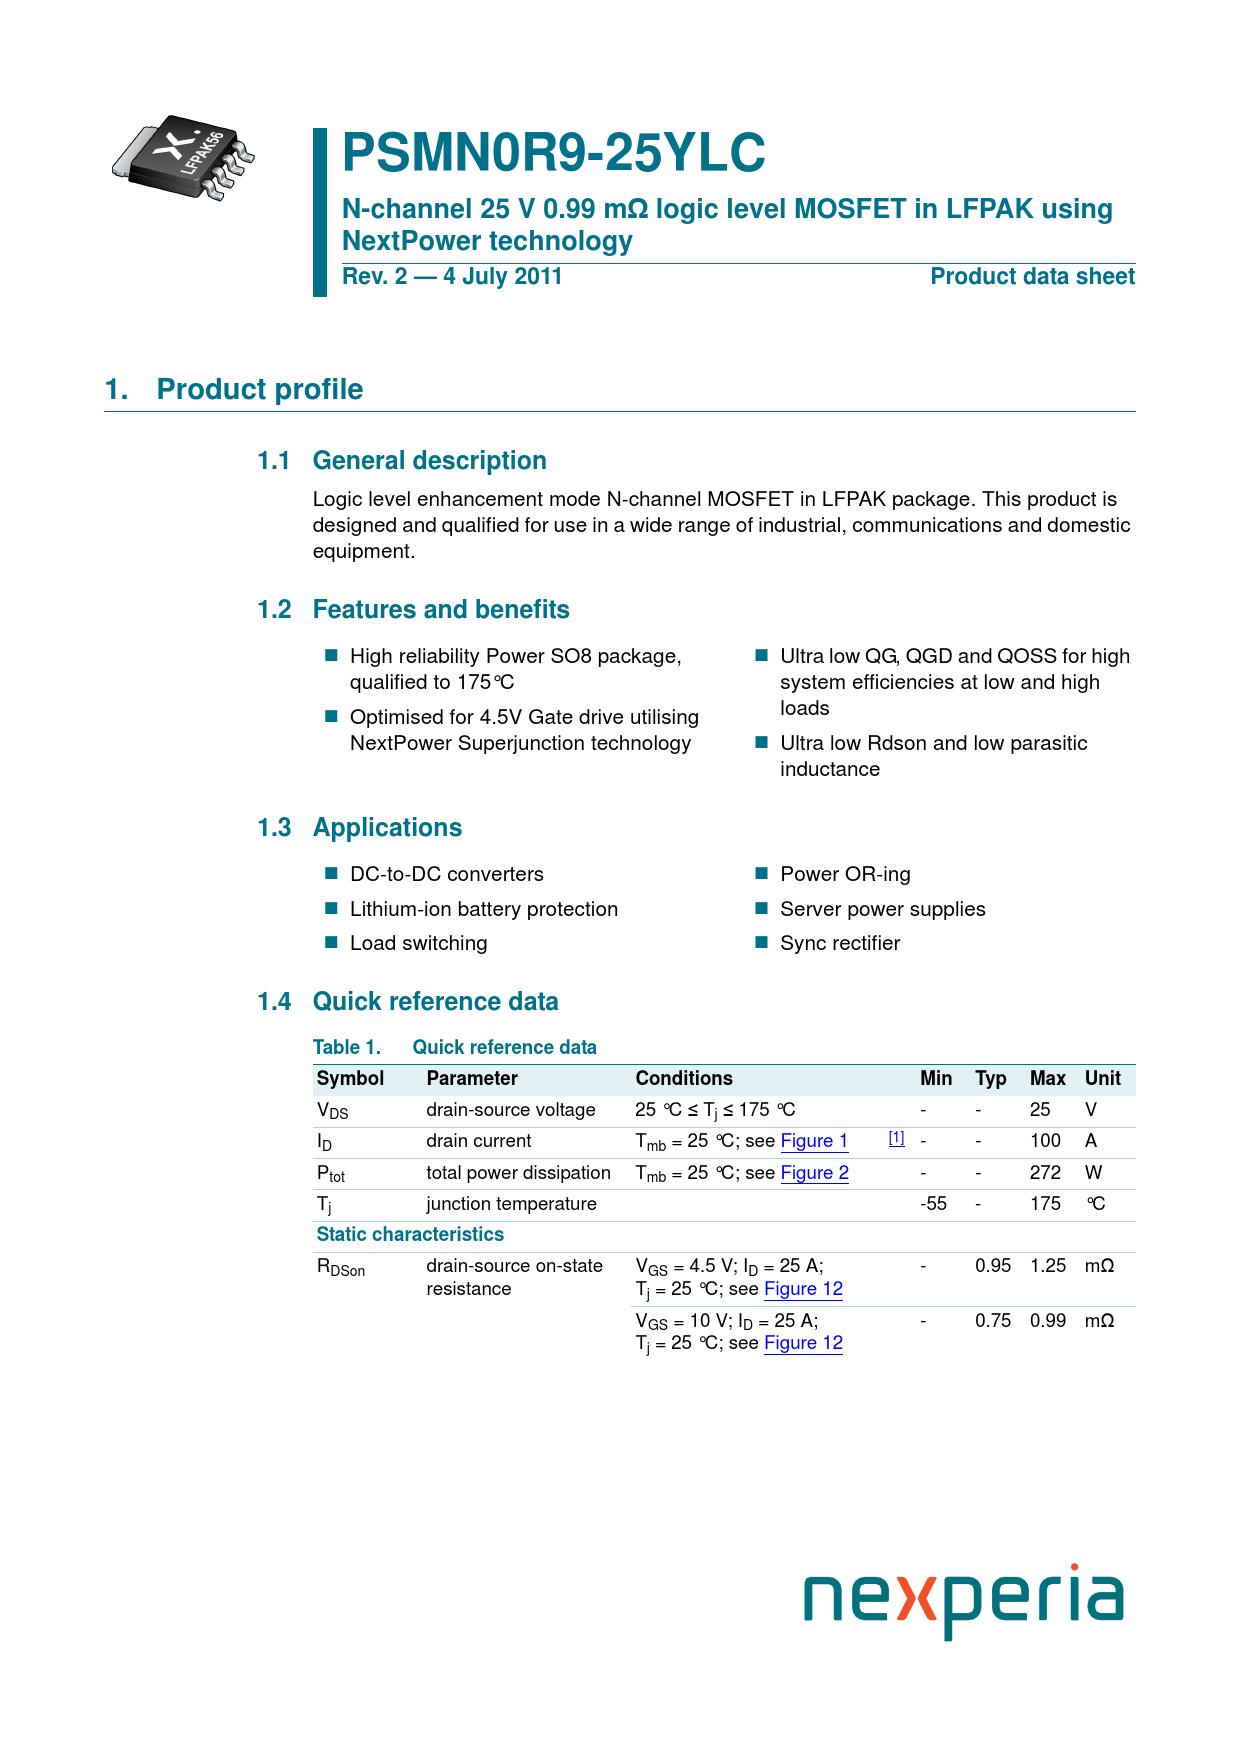 Datasheet PSMN0R9-25YLC Nexperia, Revision: 02042018